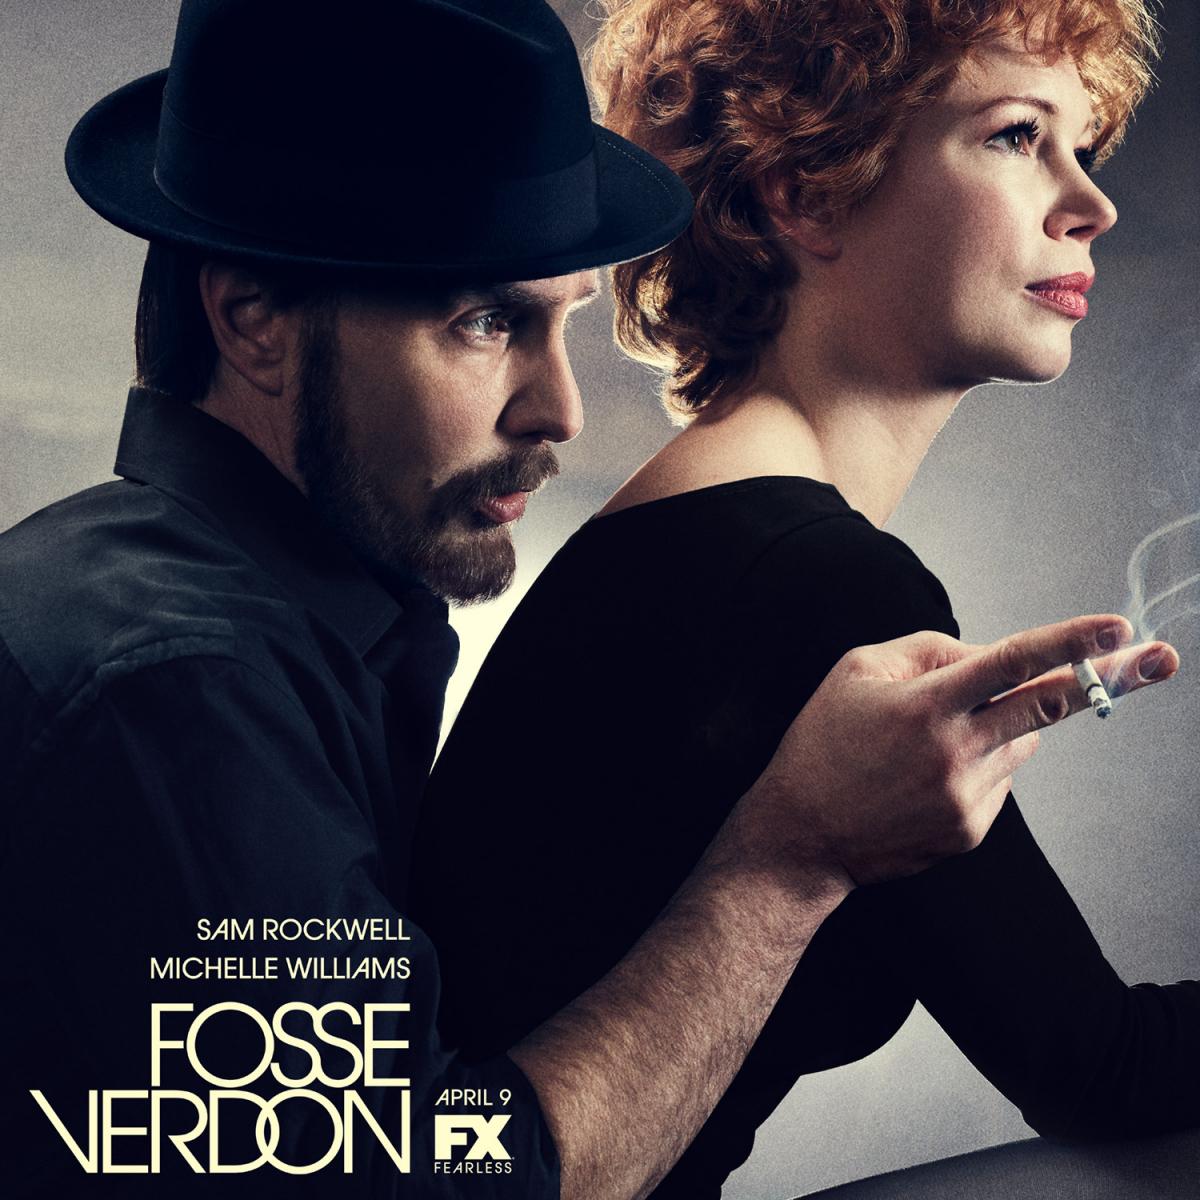 Fosse Verdon on FX